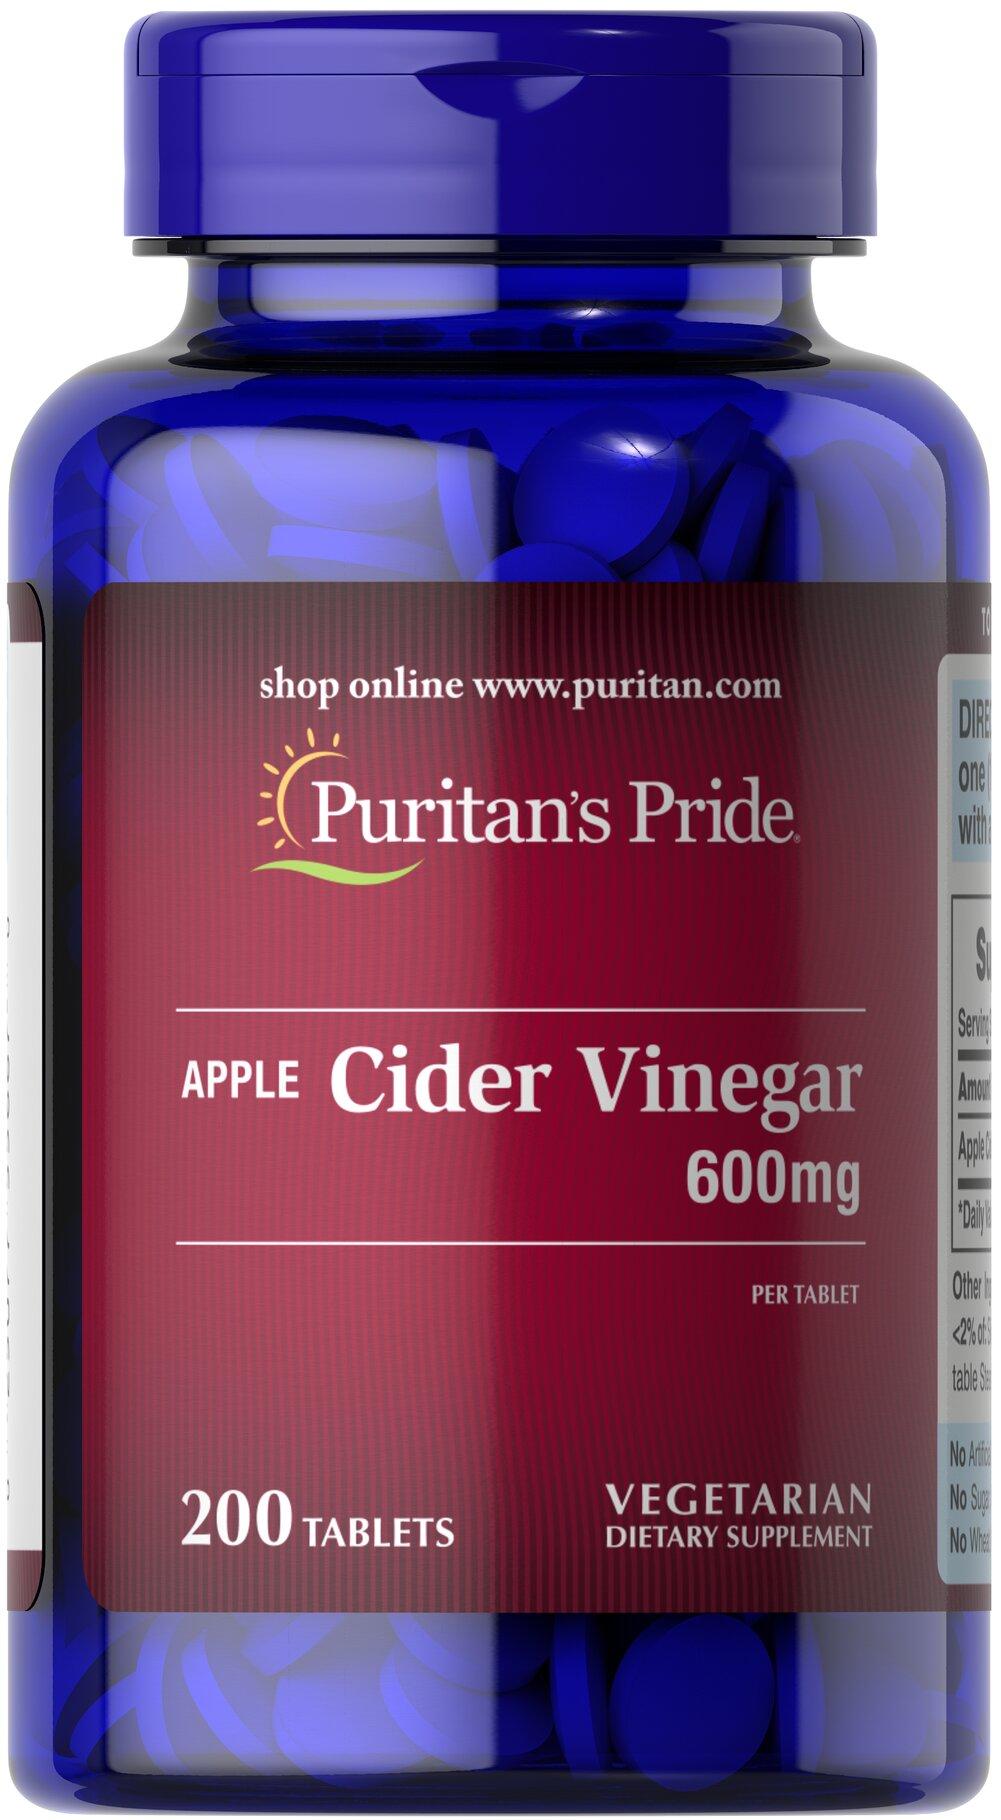 Puritan's Pride Apple Cider Vinegar 600 mg - 200 Tablets